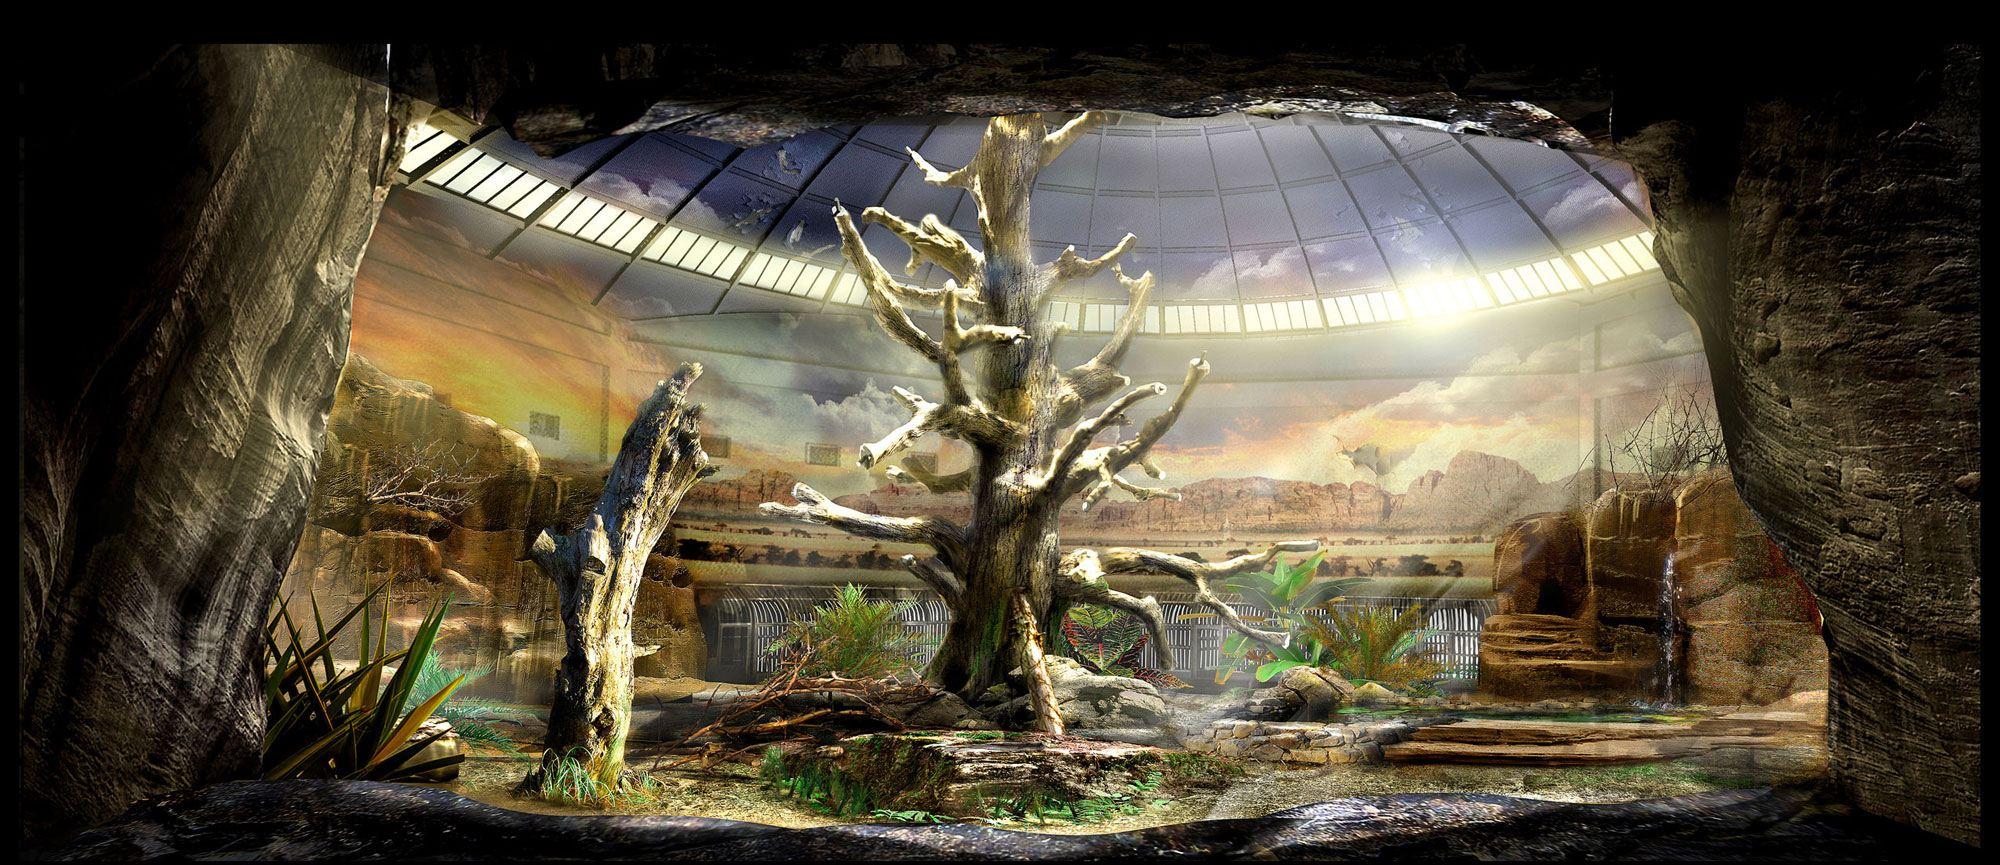 концепт-арты Восстание планеты обезьян